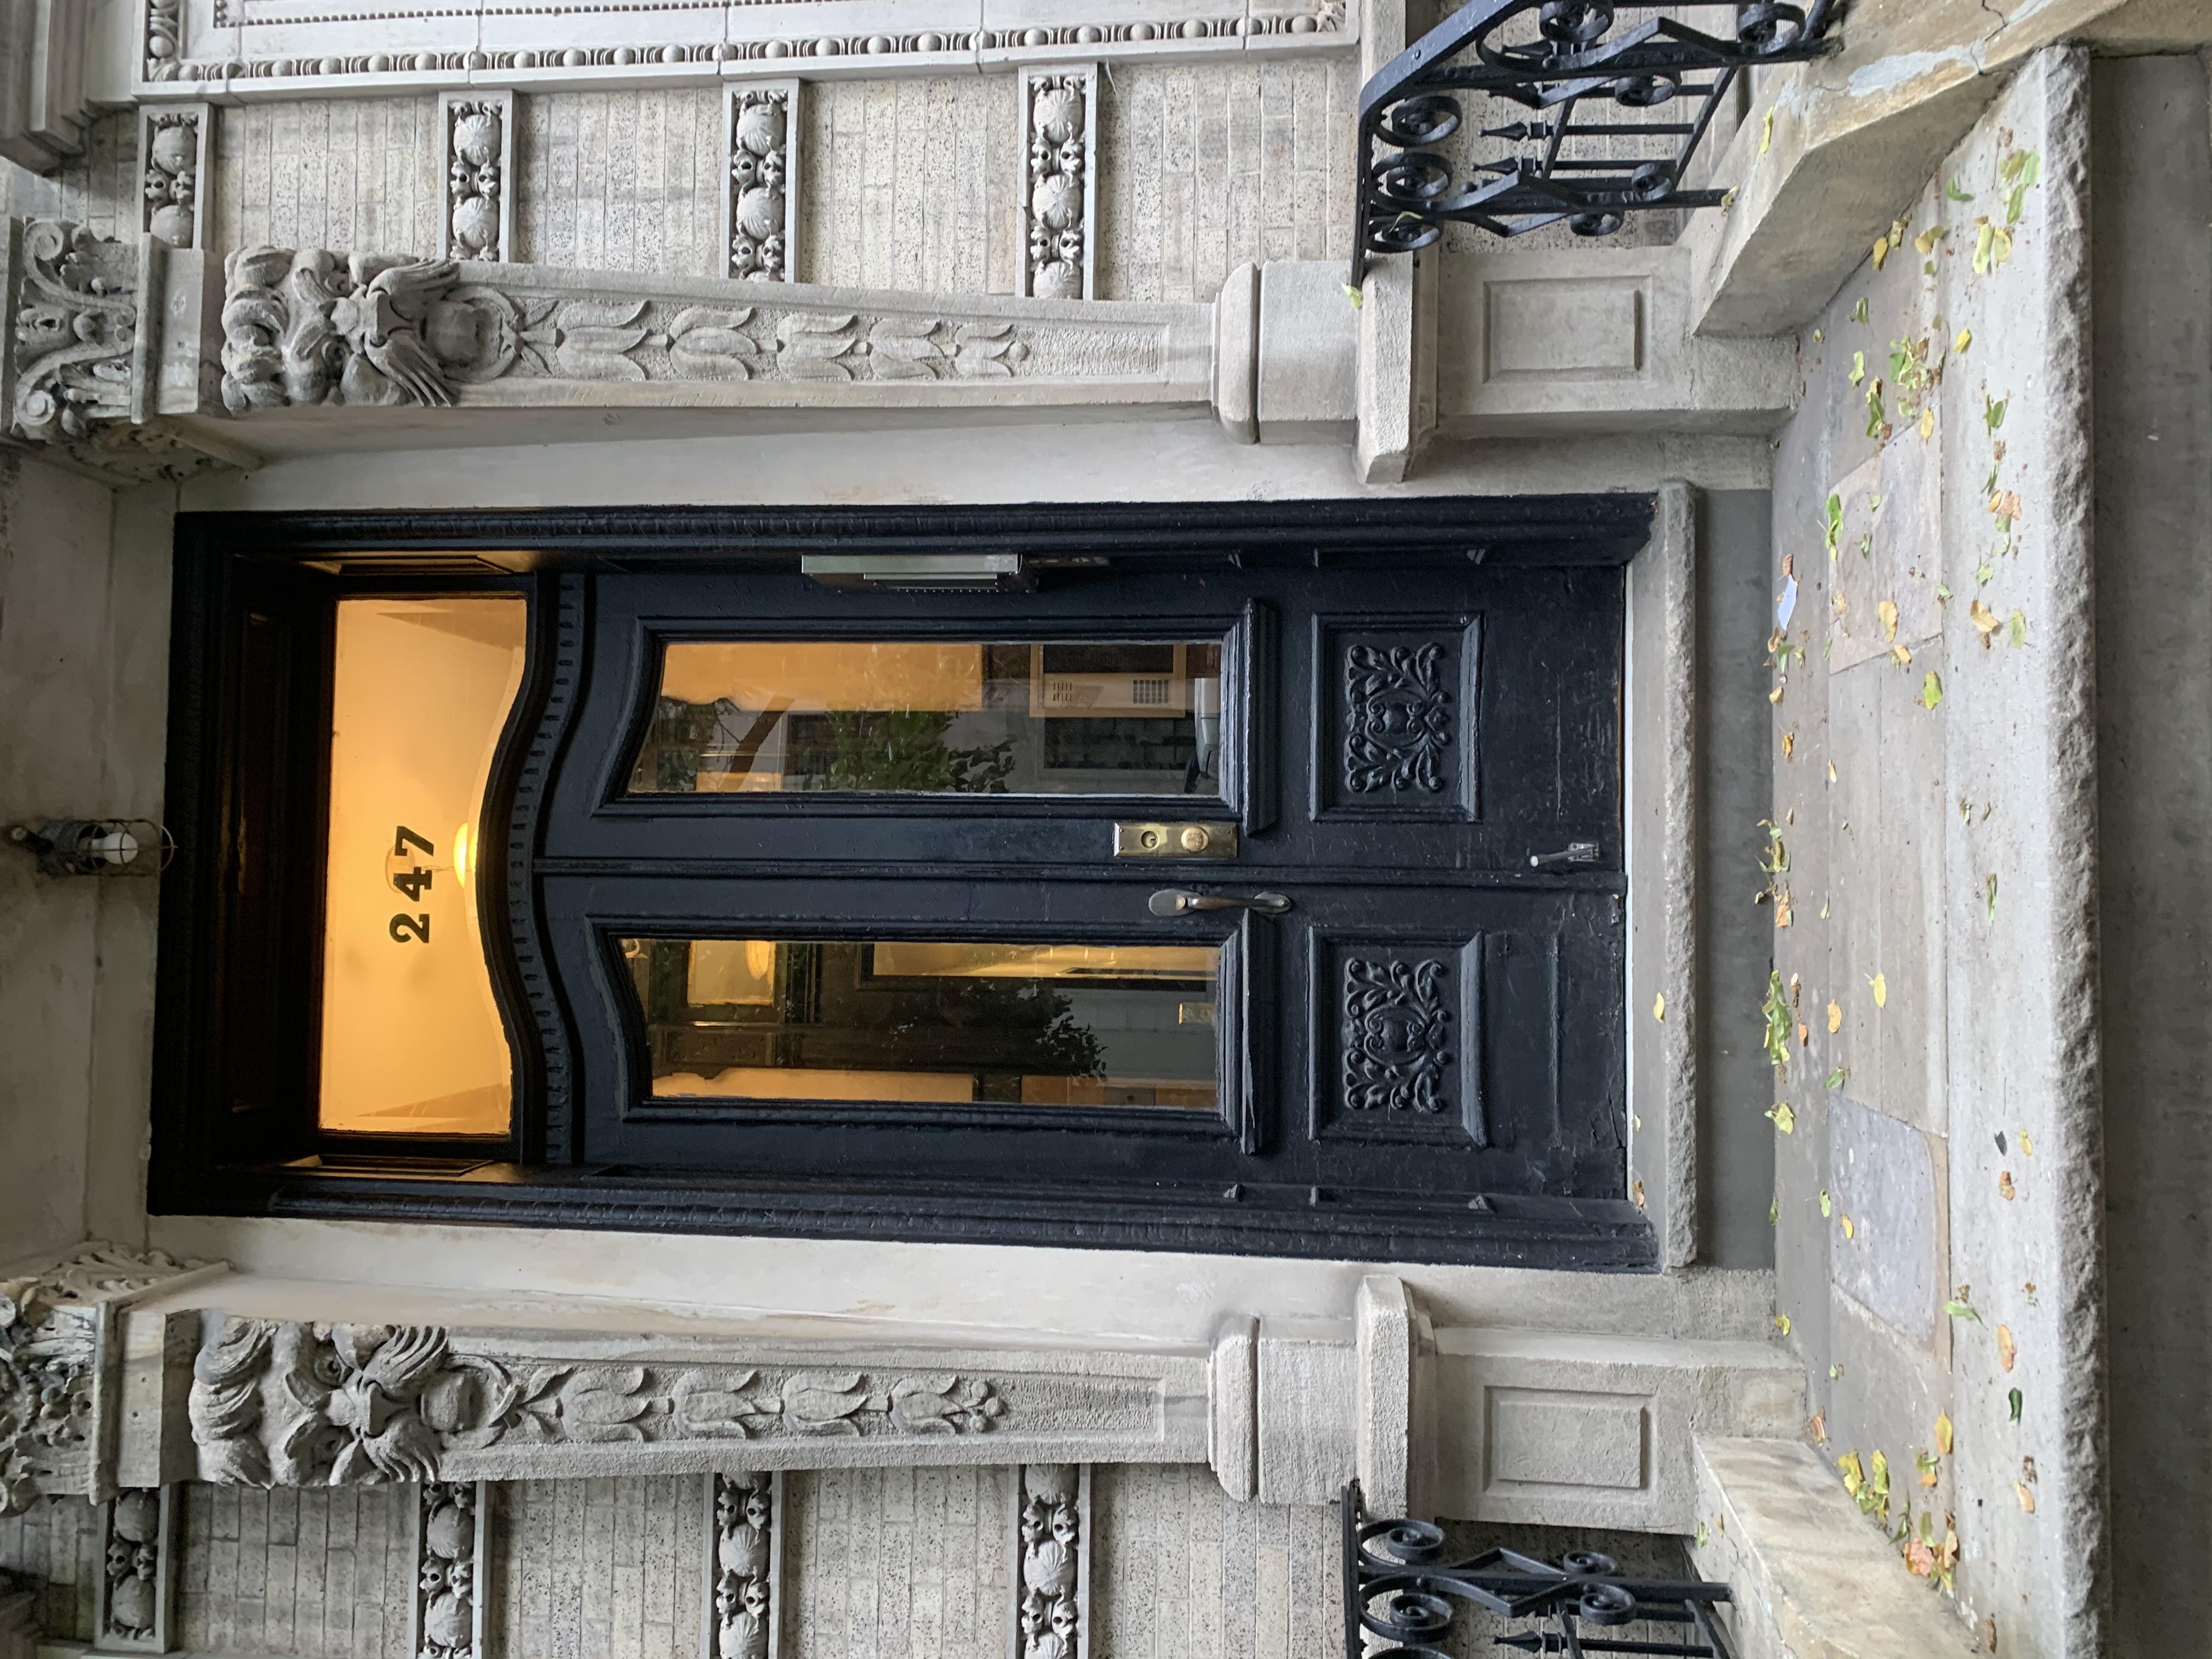 247 East 62nd Street Upper East Side New York NY 10065